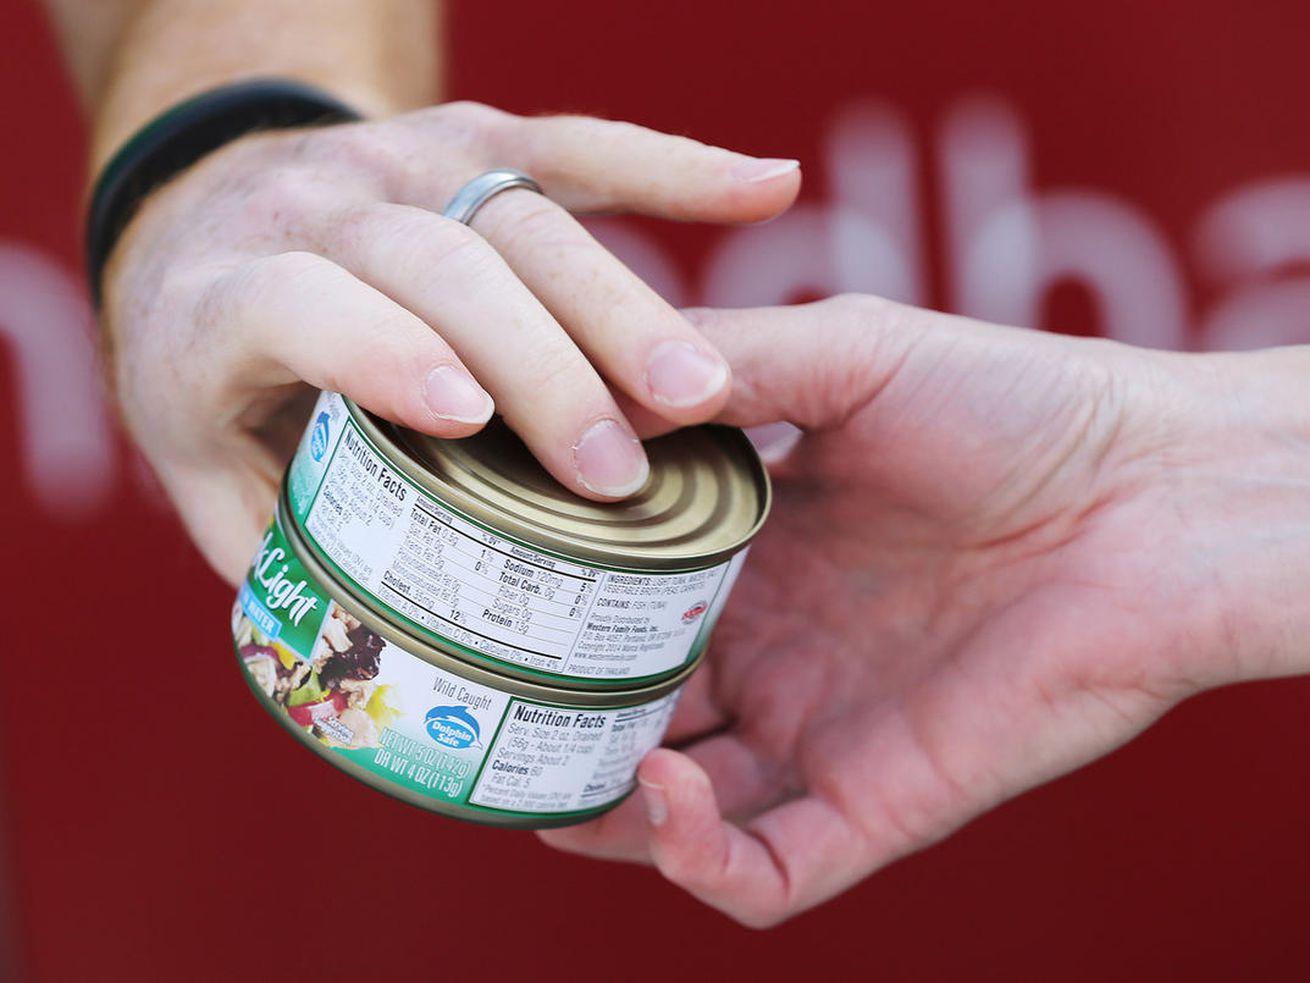 Utah Food Bank receives $50K to expand Mobile School Pantry program in Utah County